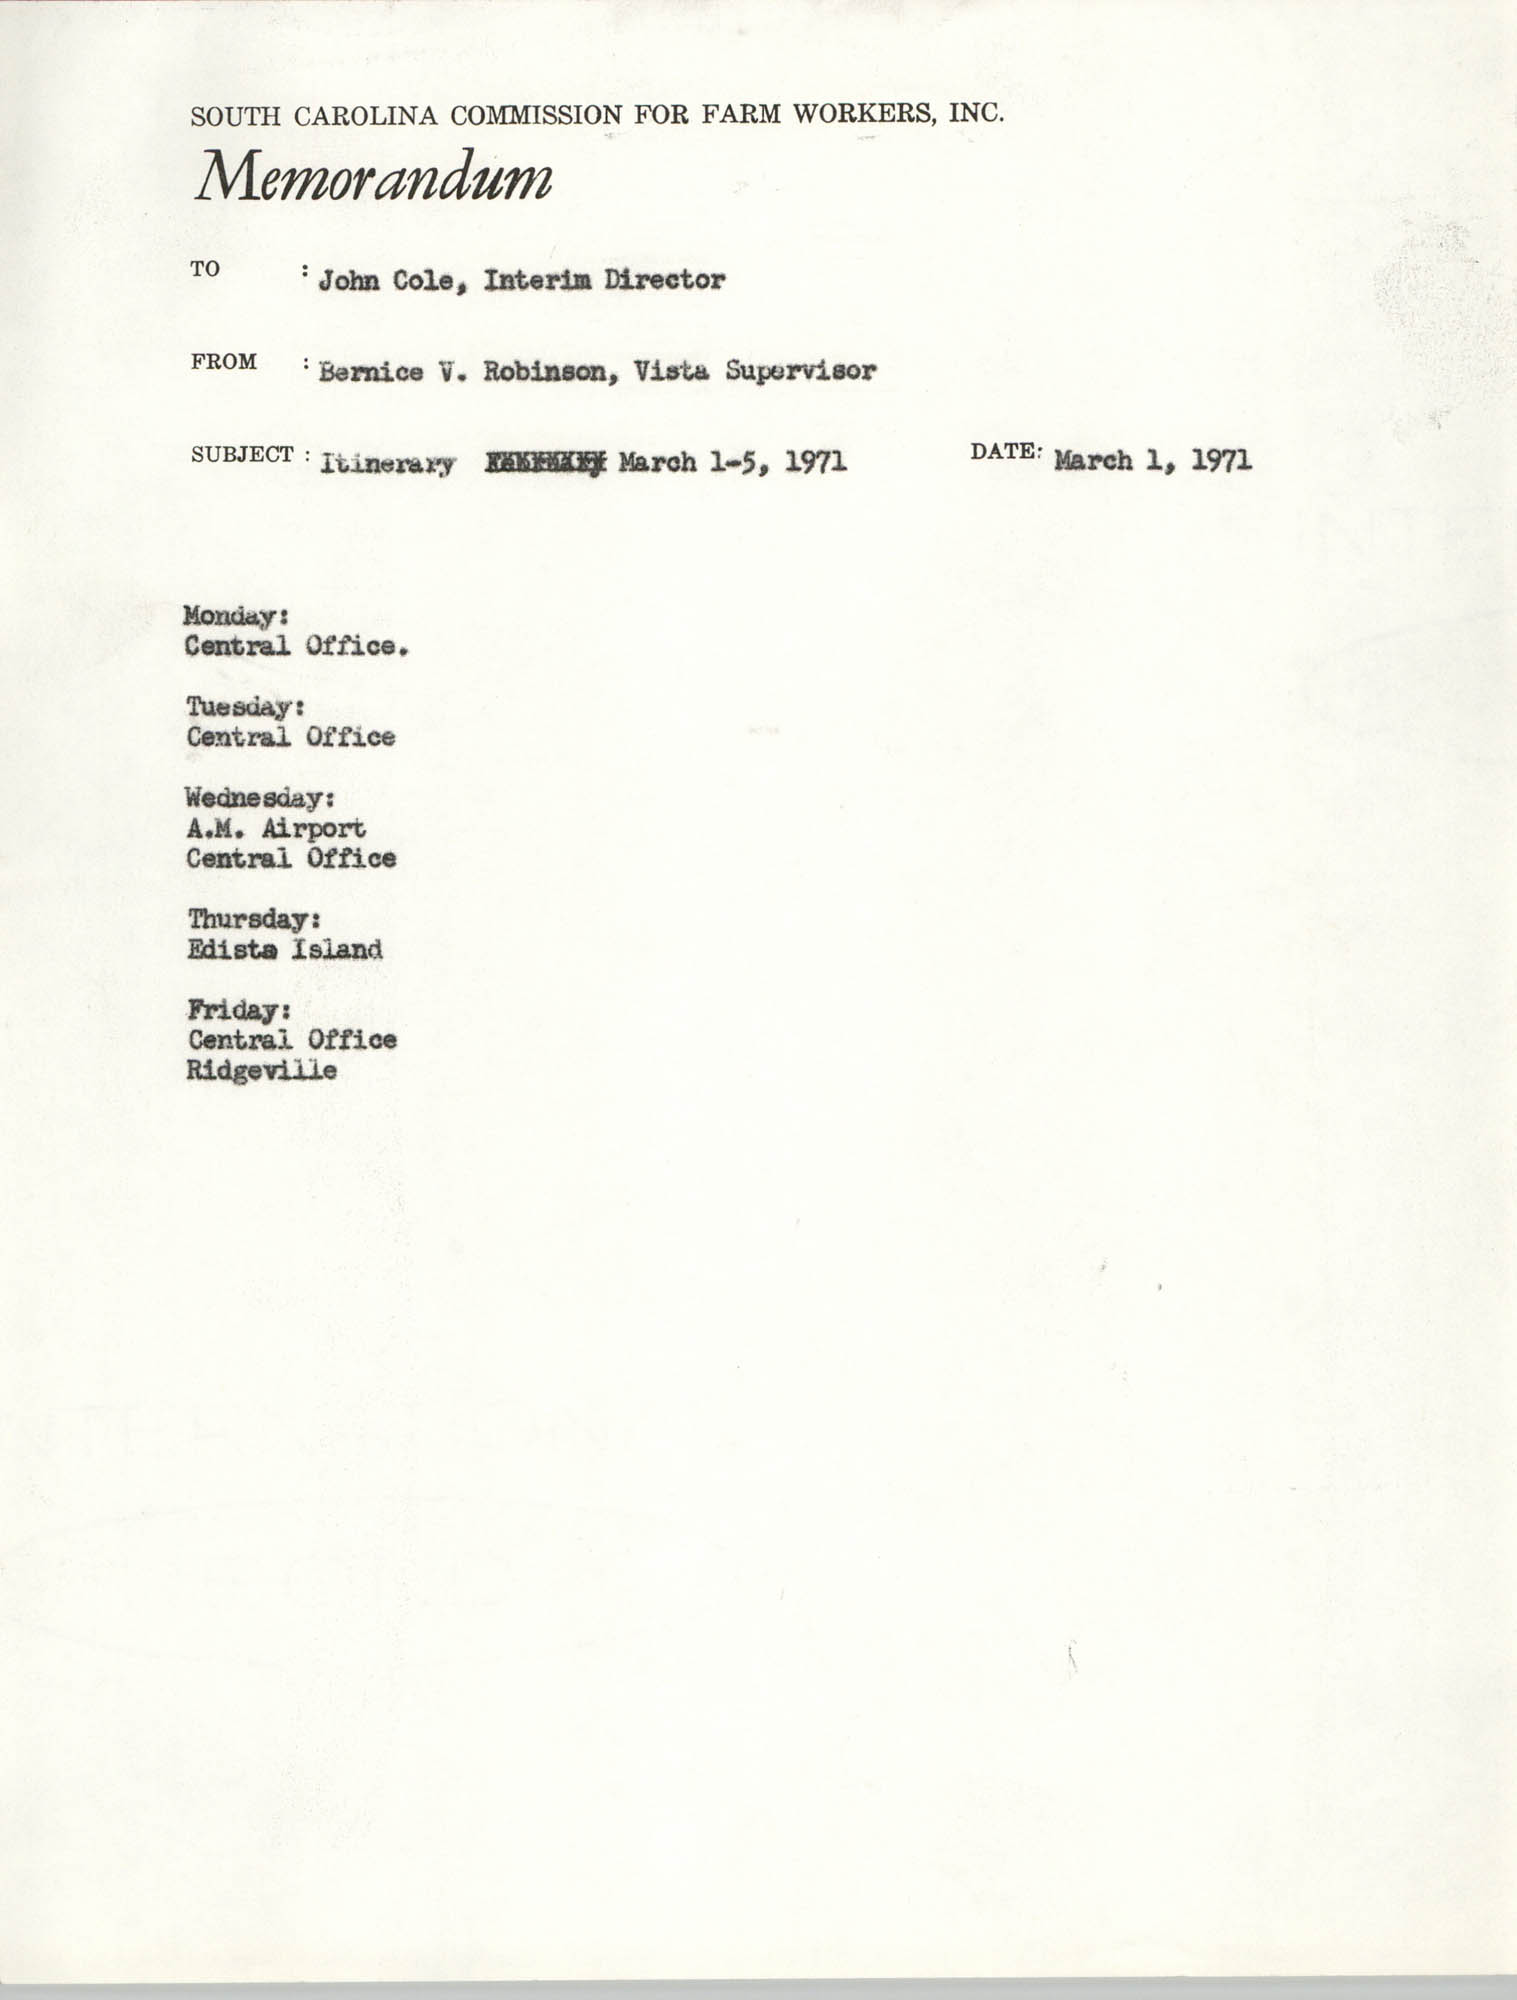 Memorandum from Bernice V. Robinson to John Cole, March 1, 1971